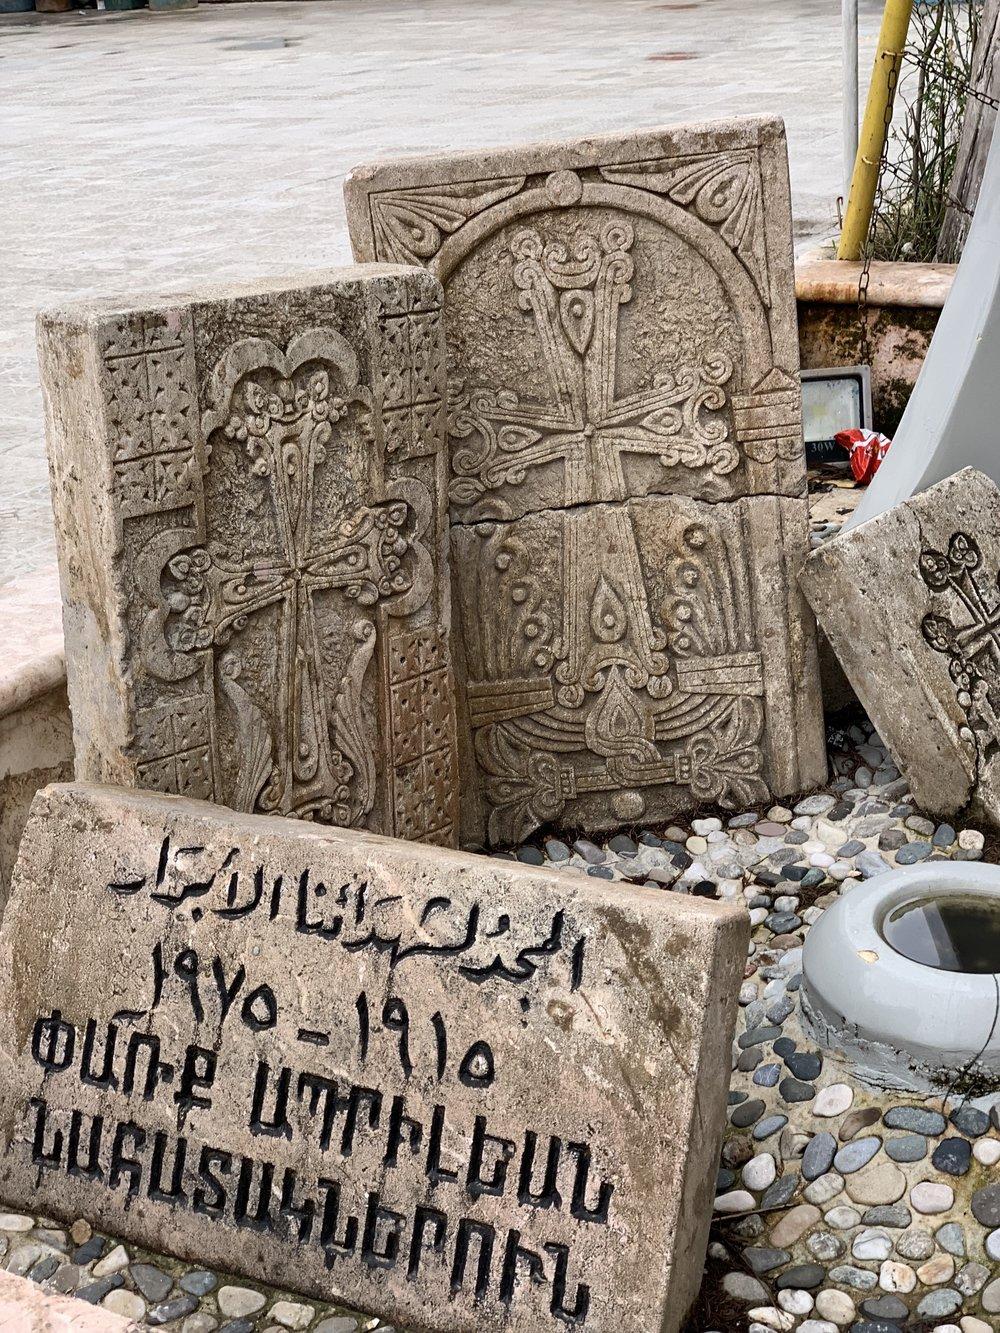 Armenian genocide memorial in Qamishly